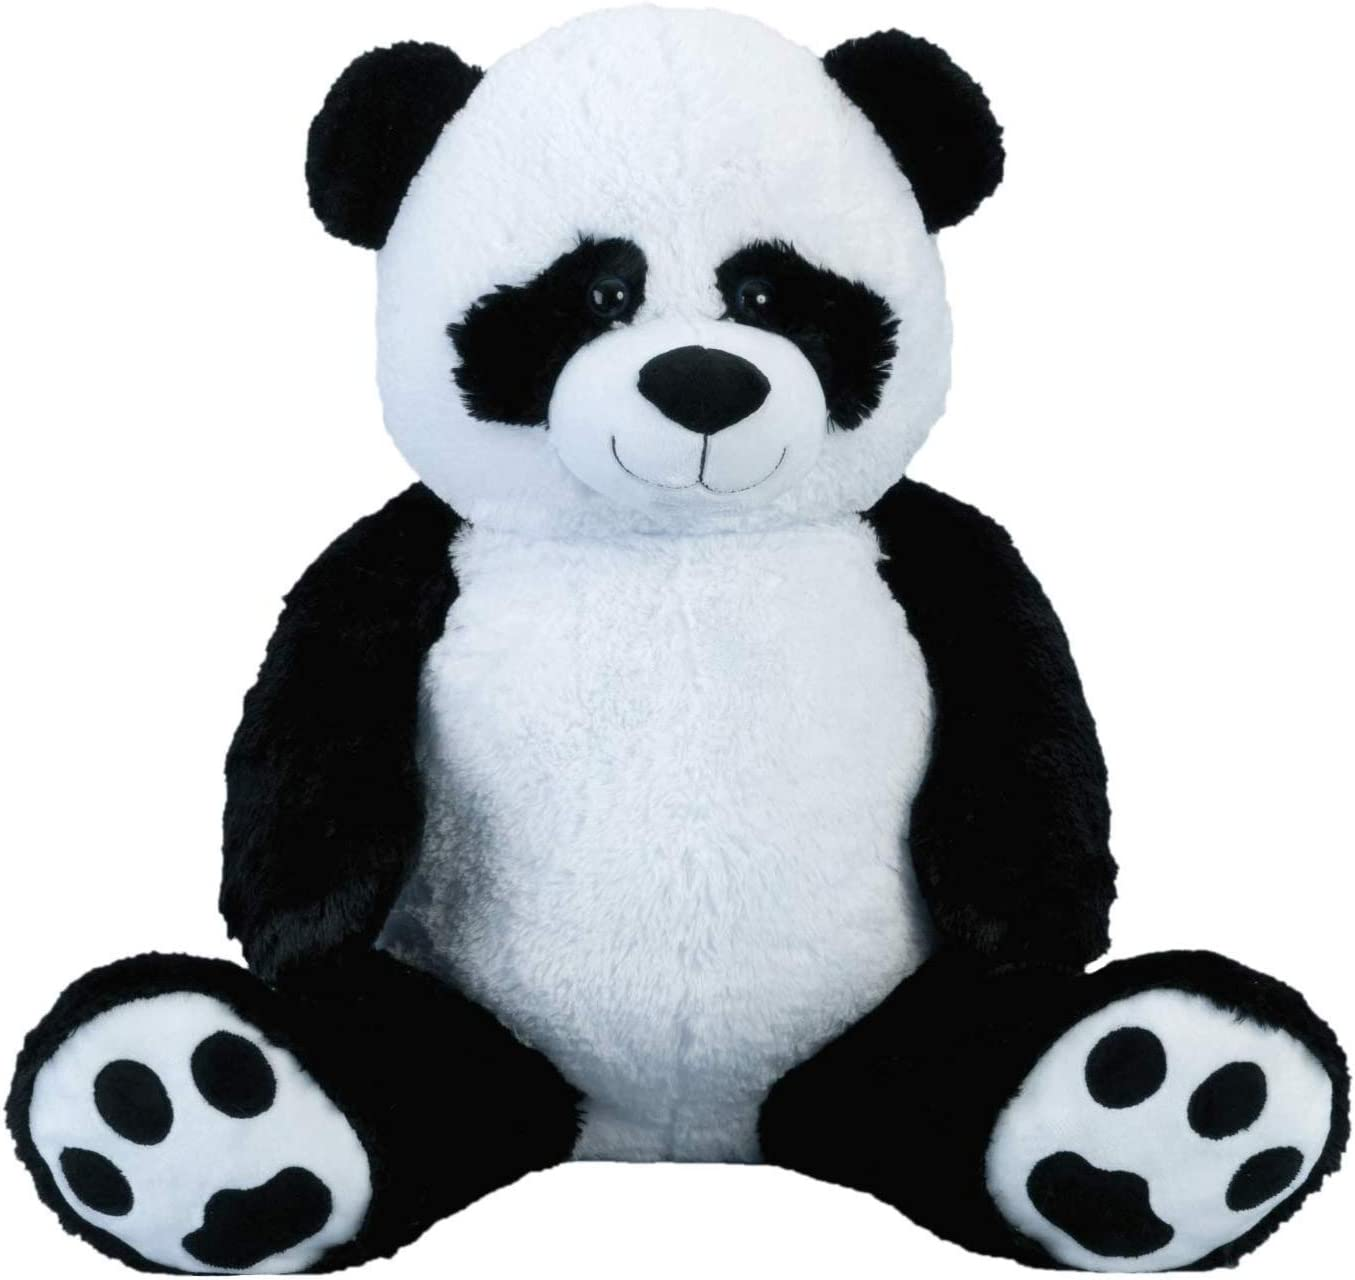 New Large Cuddly Panda Teddy Bear Plush Stuffed Lovely Toy Soft Toy Kids Gift